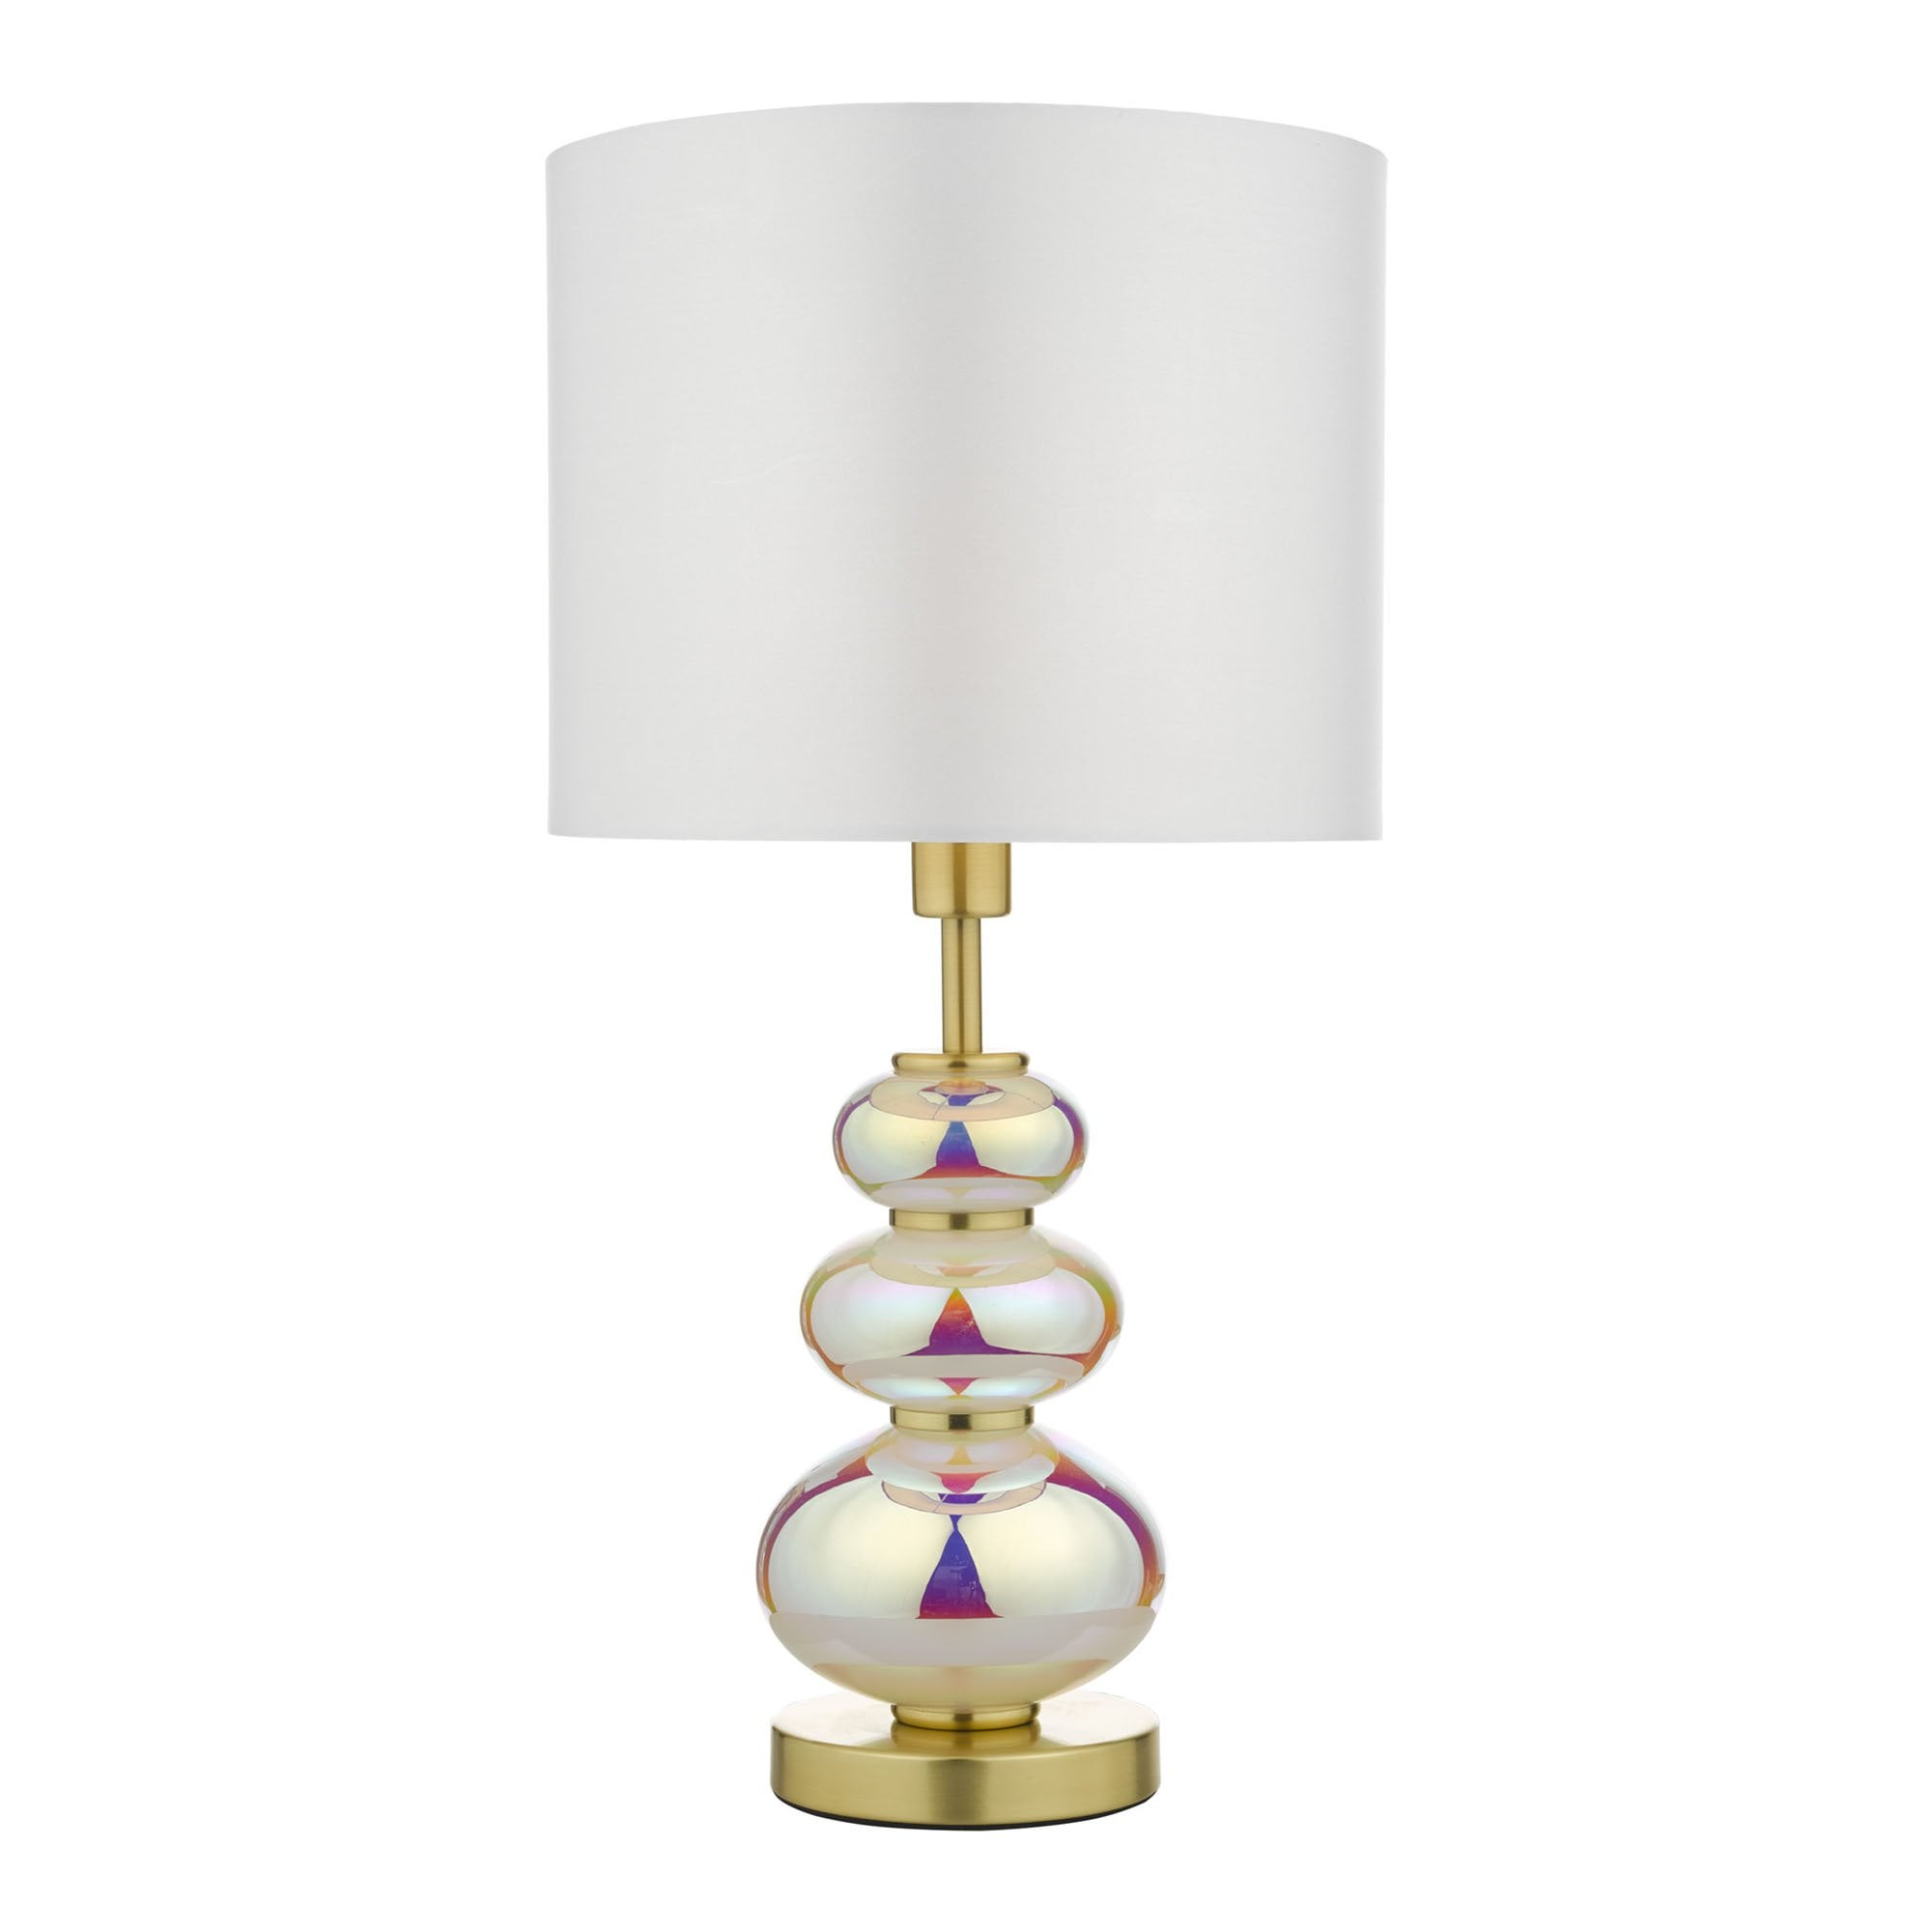 Kiandra Table Lamp Iridescent Lamp Shade Lighting And Lights